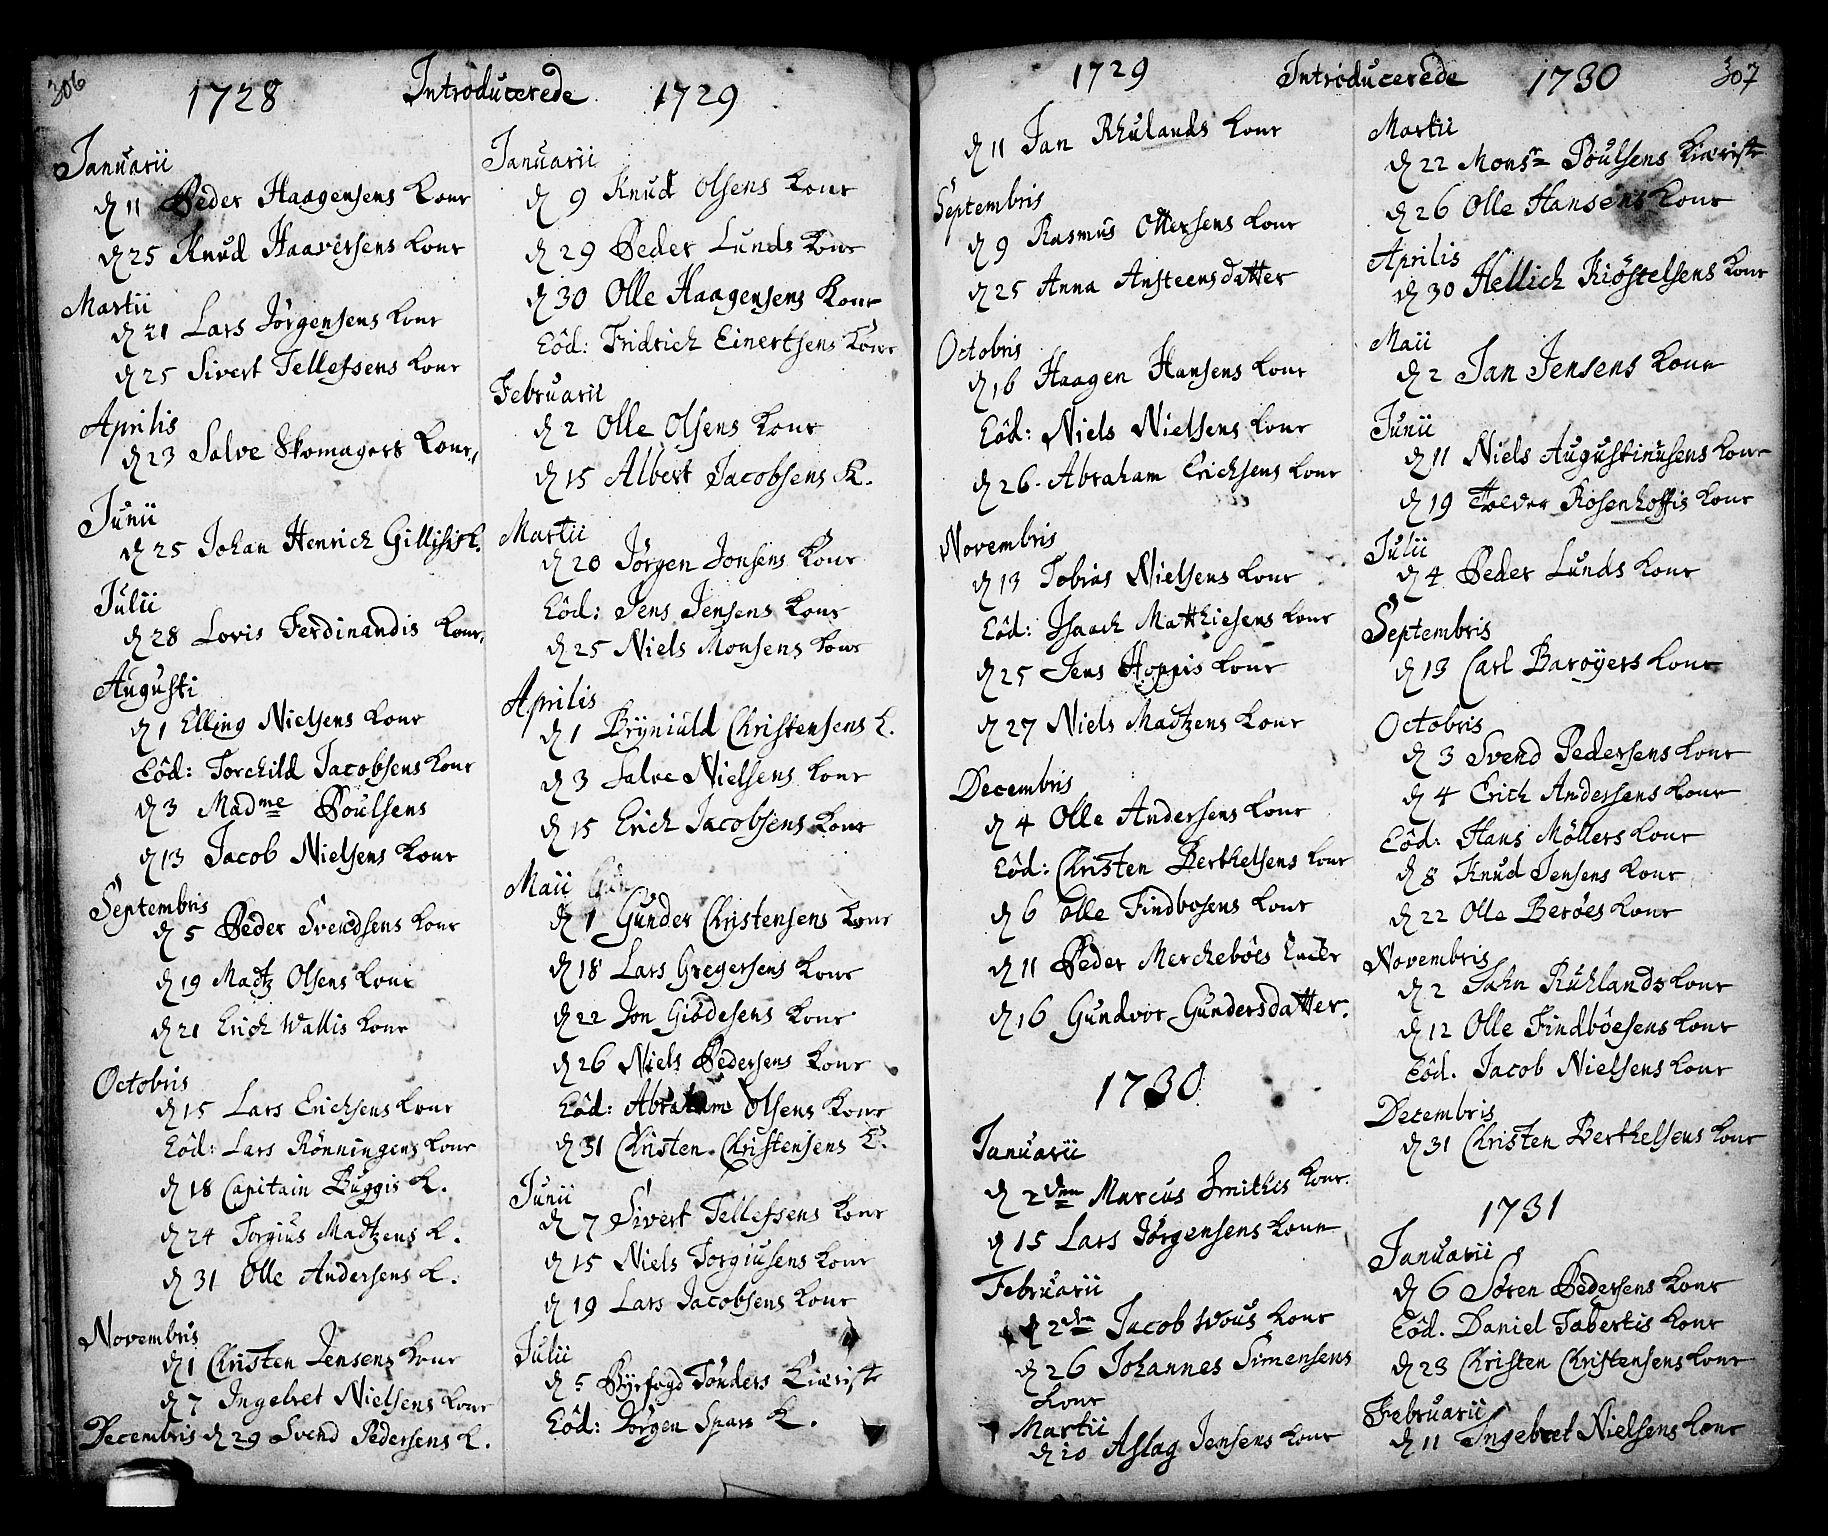 SAKO, Kragerø kirkebøker, F/Fa/L0001: Ministerialbok nr. 1, 1702-1766, s. 306-307